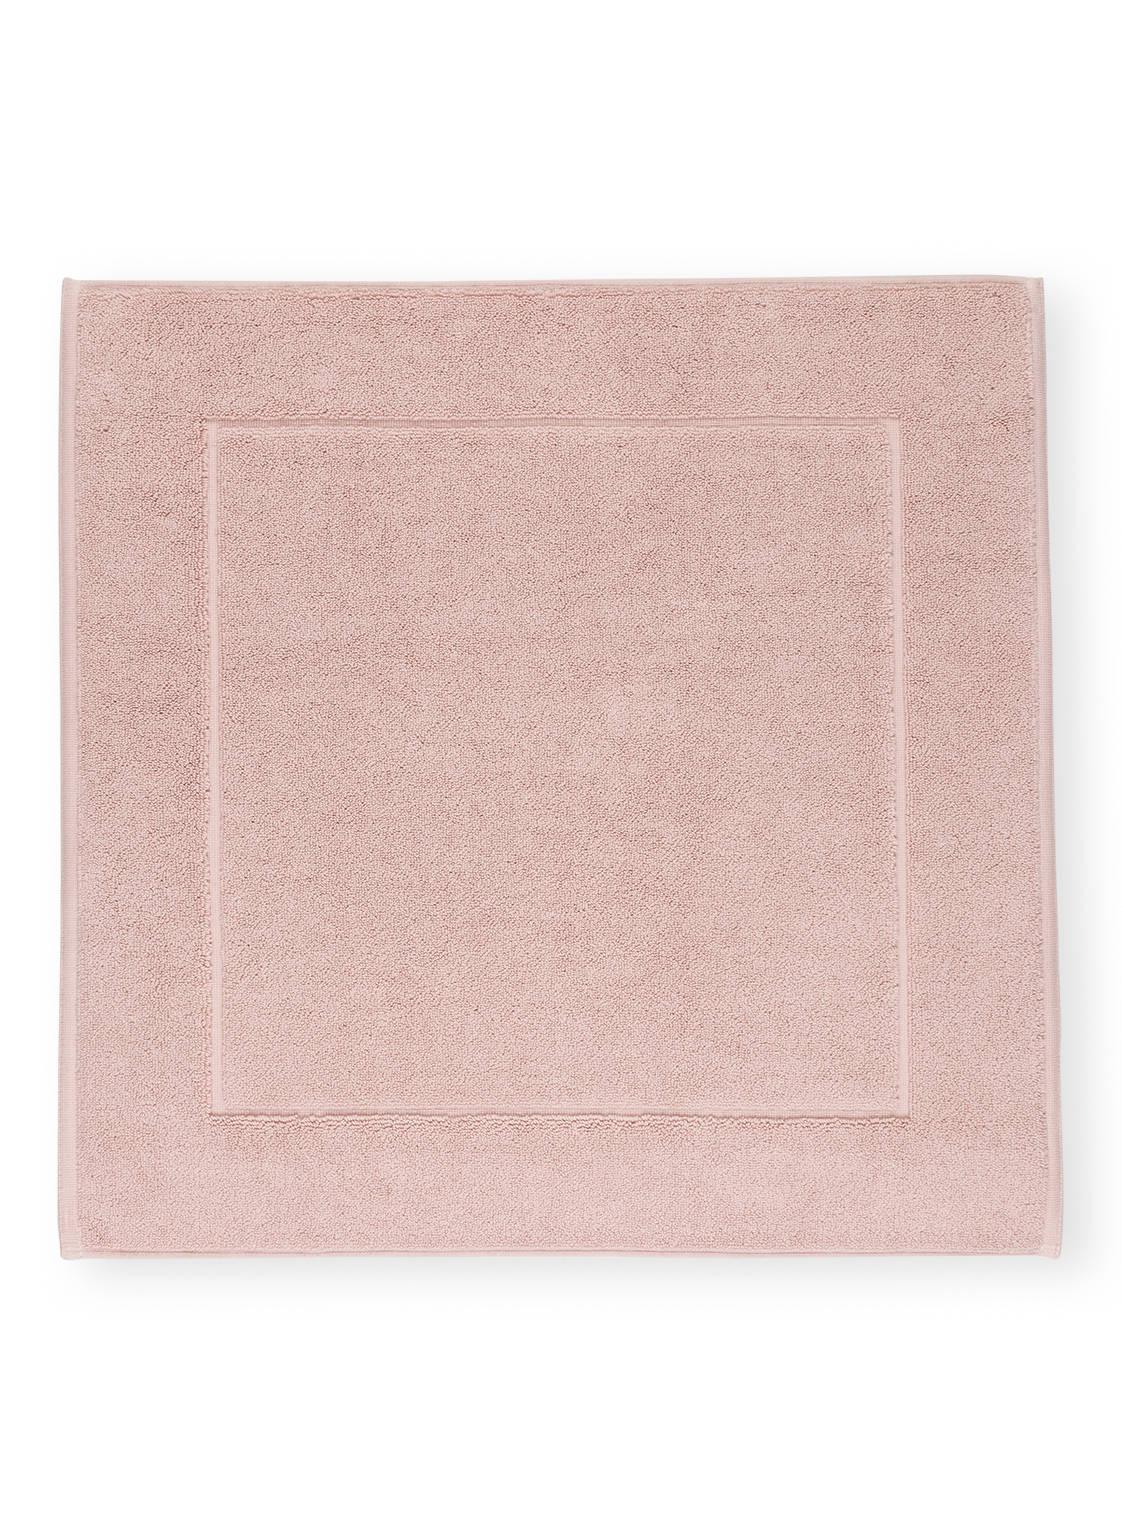 Image of Aquanova Badematte London rosa